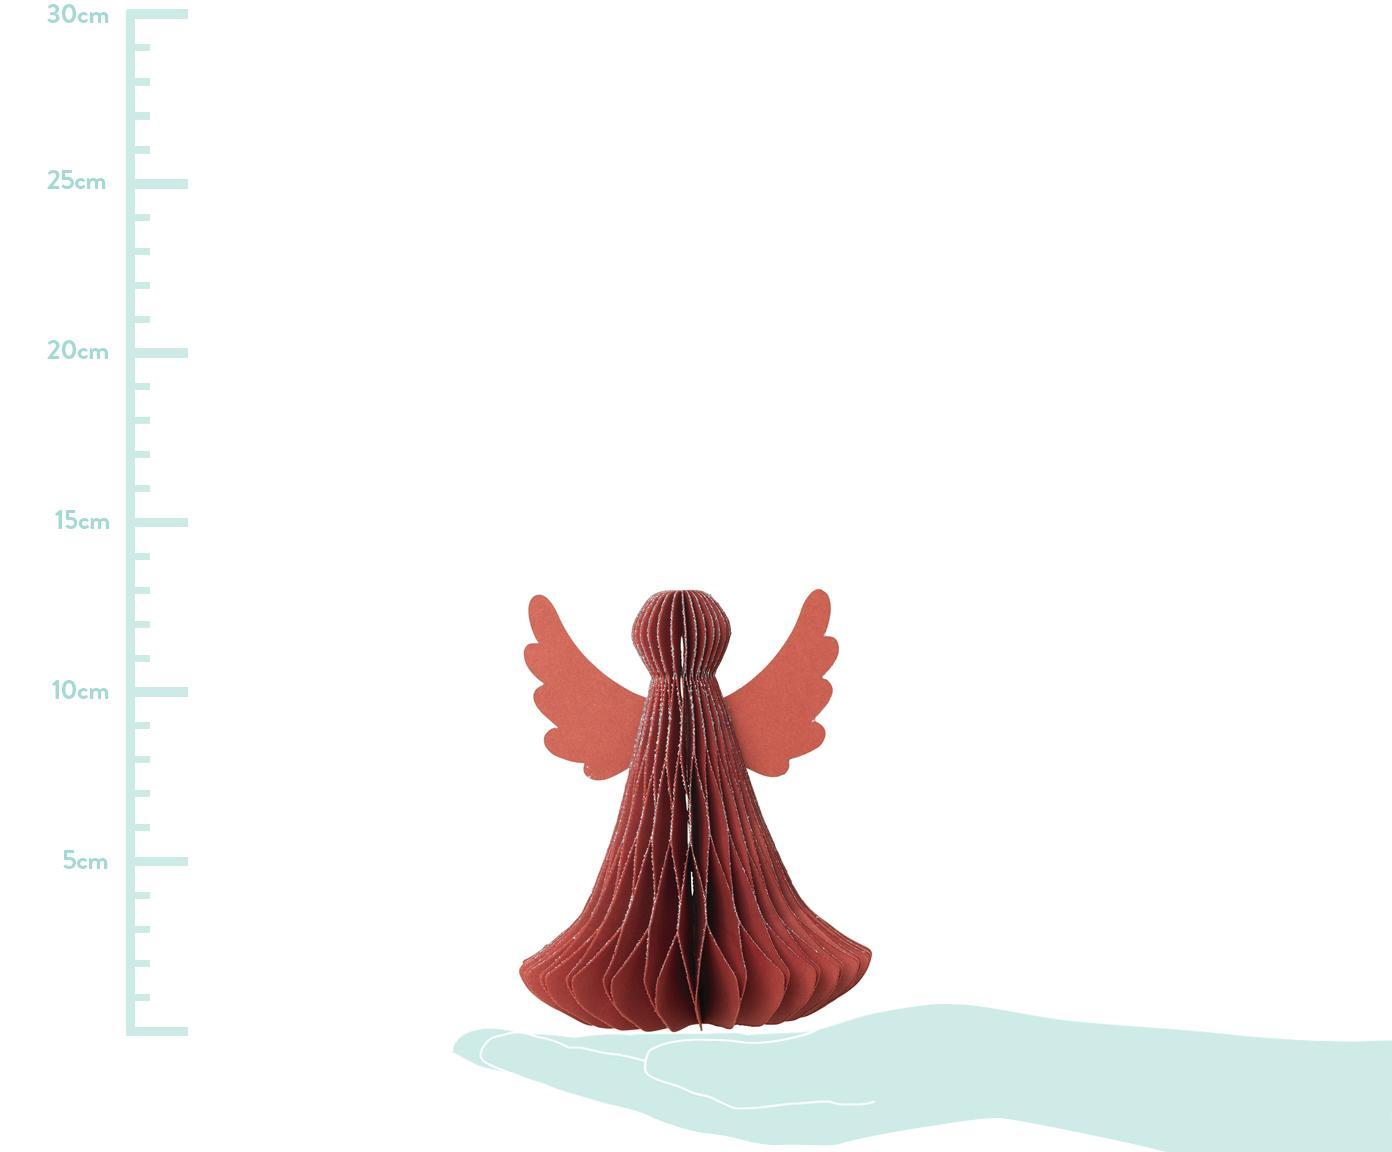 Deko-Objekte Angel, 2 Stück, Papier, Rot, Ø 10 x H 13 cm